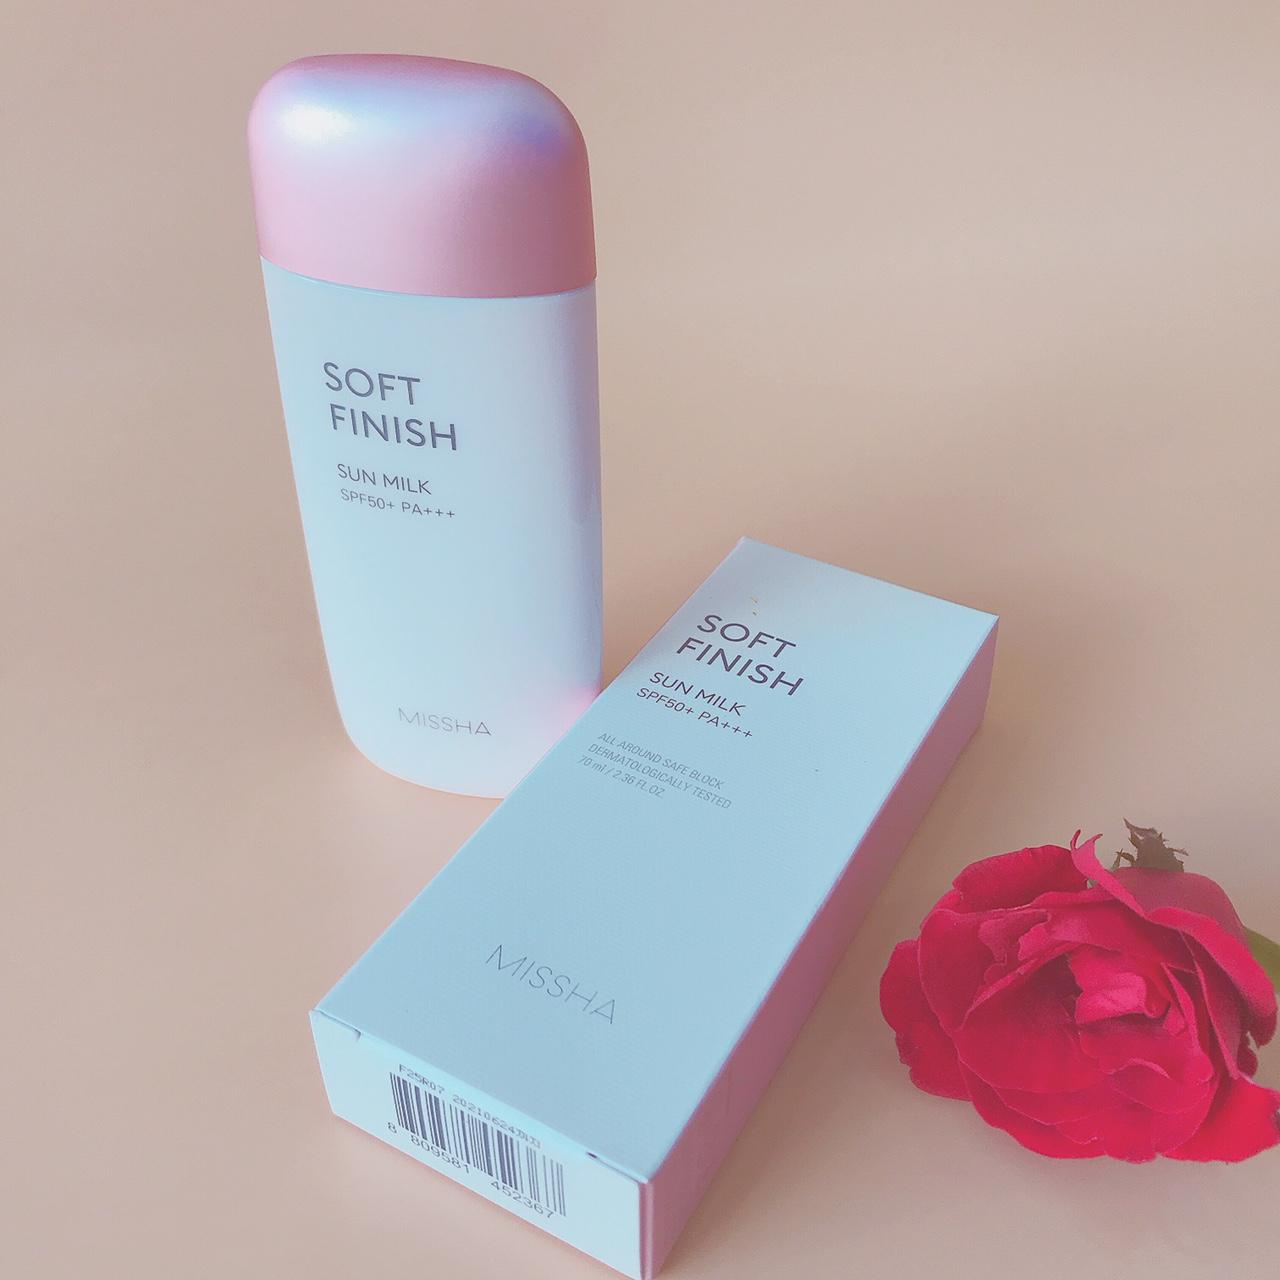 Kem Chống Nắng Missha All-around Safe Block Soft Finish Sun Milk SPF50+/PA+++ 70ml